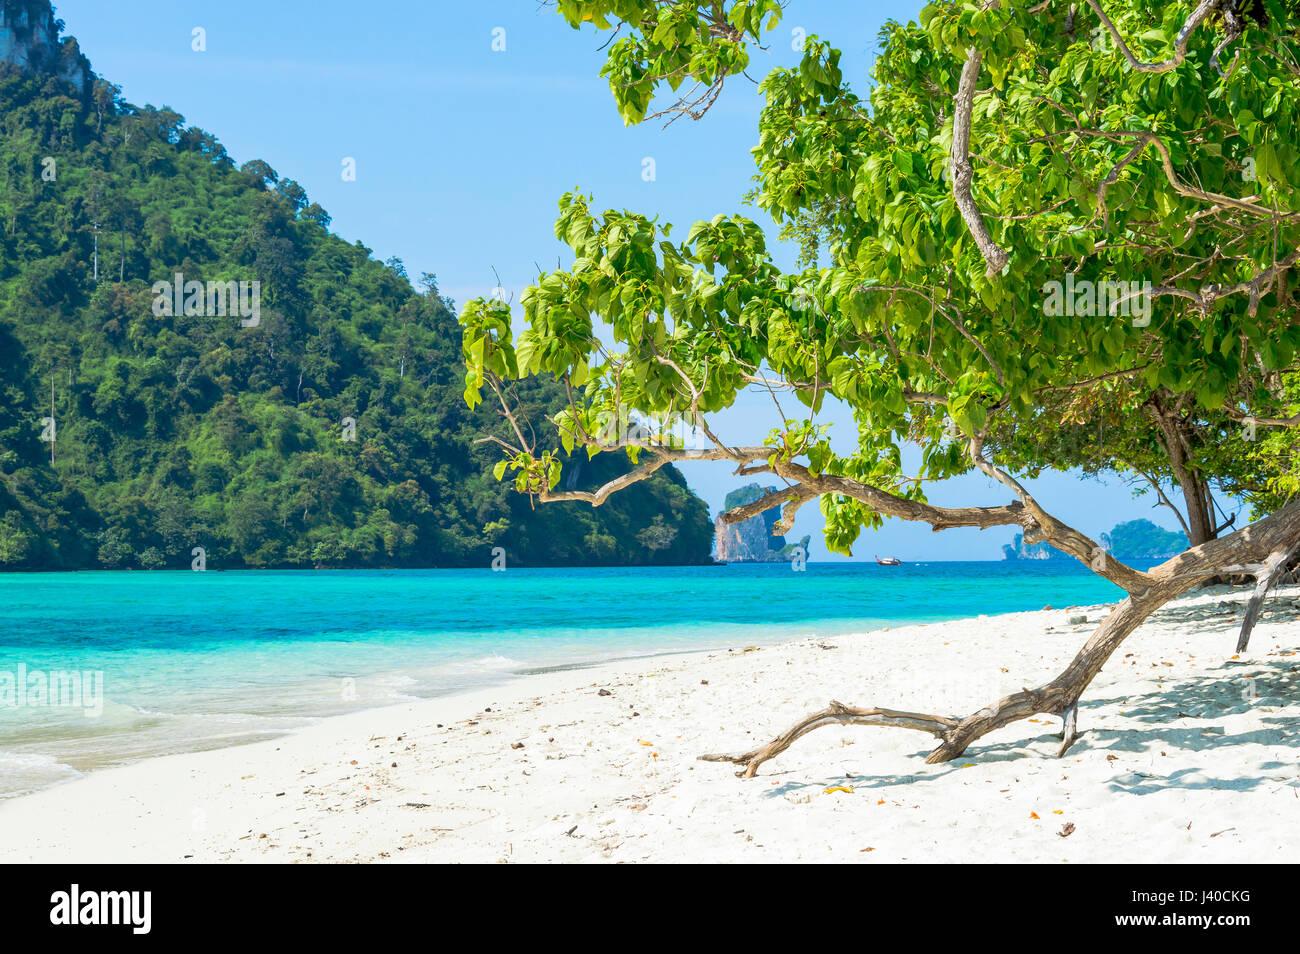 Vista panorámica de la playa de la isla contra costa tropical Imagen De Stock